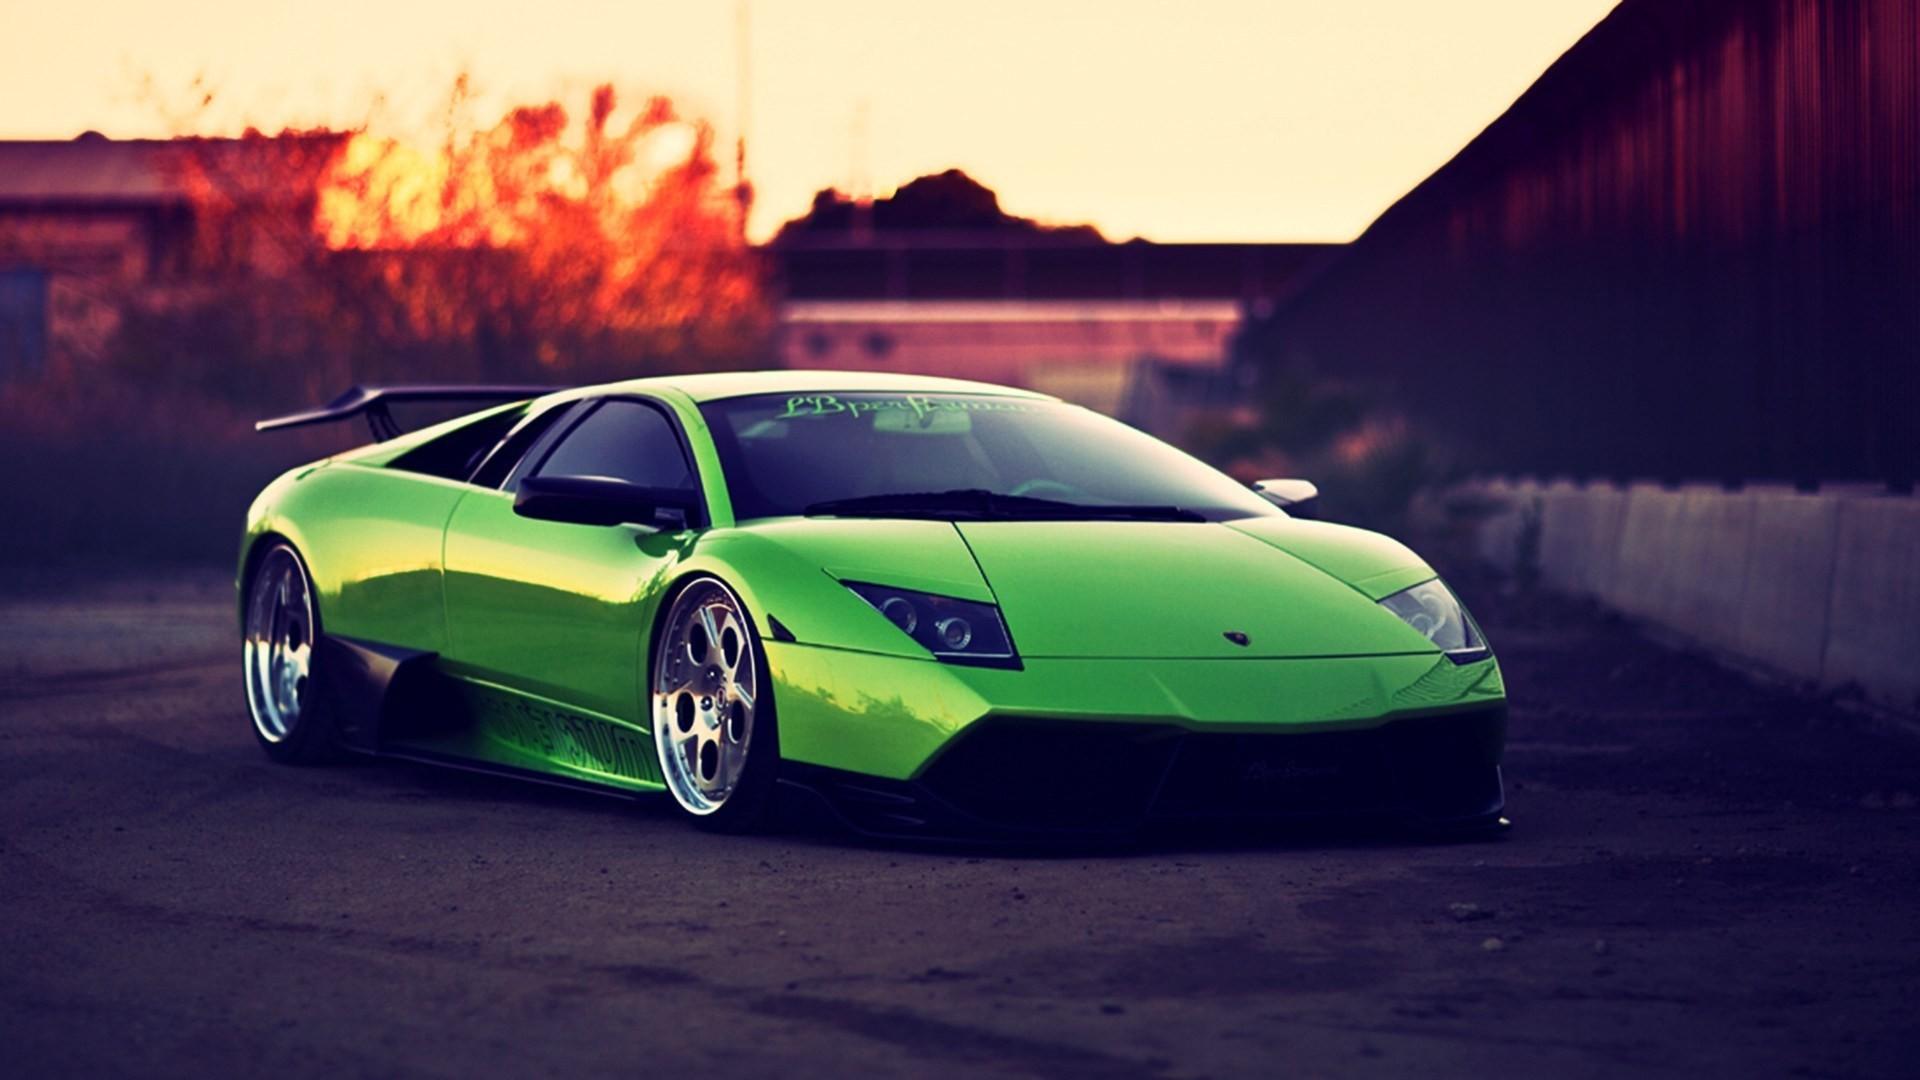 Lamborghini Reventon HD Wallpaper (85+ images)